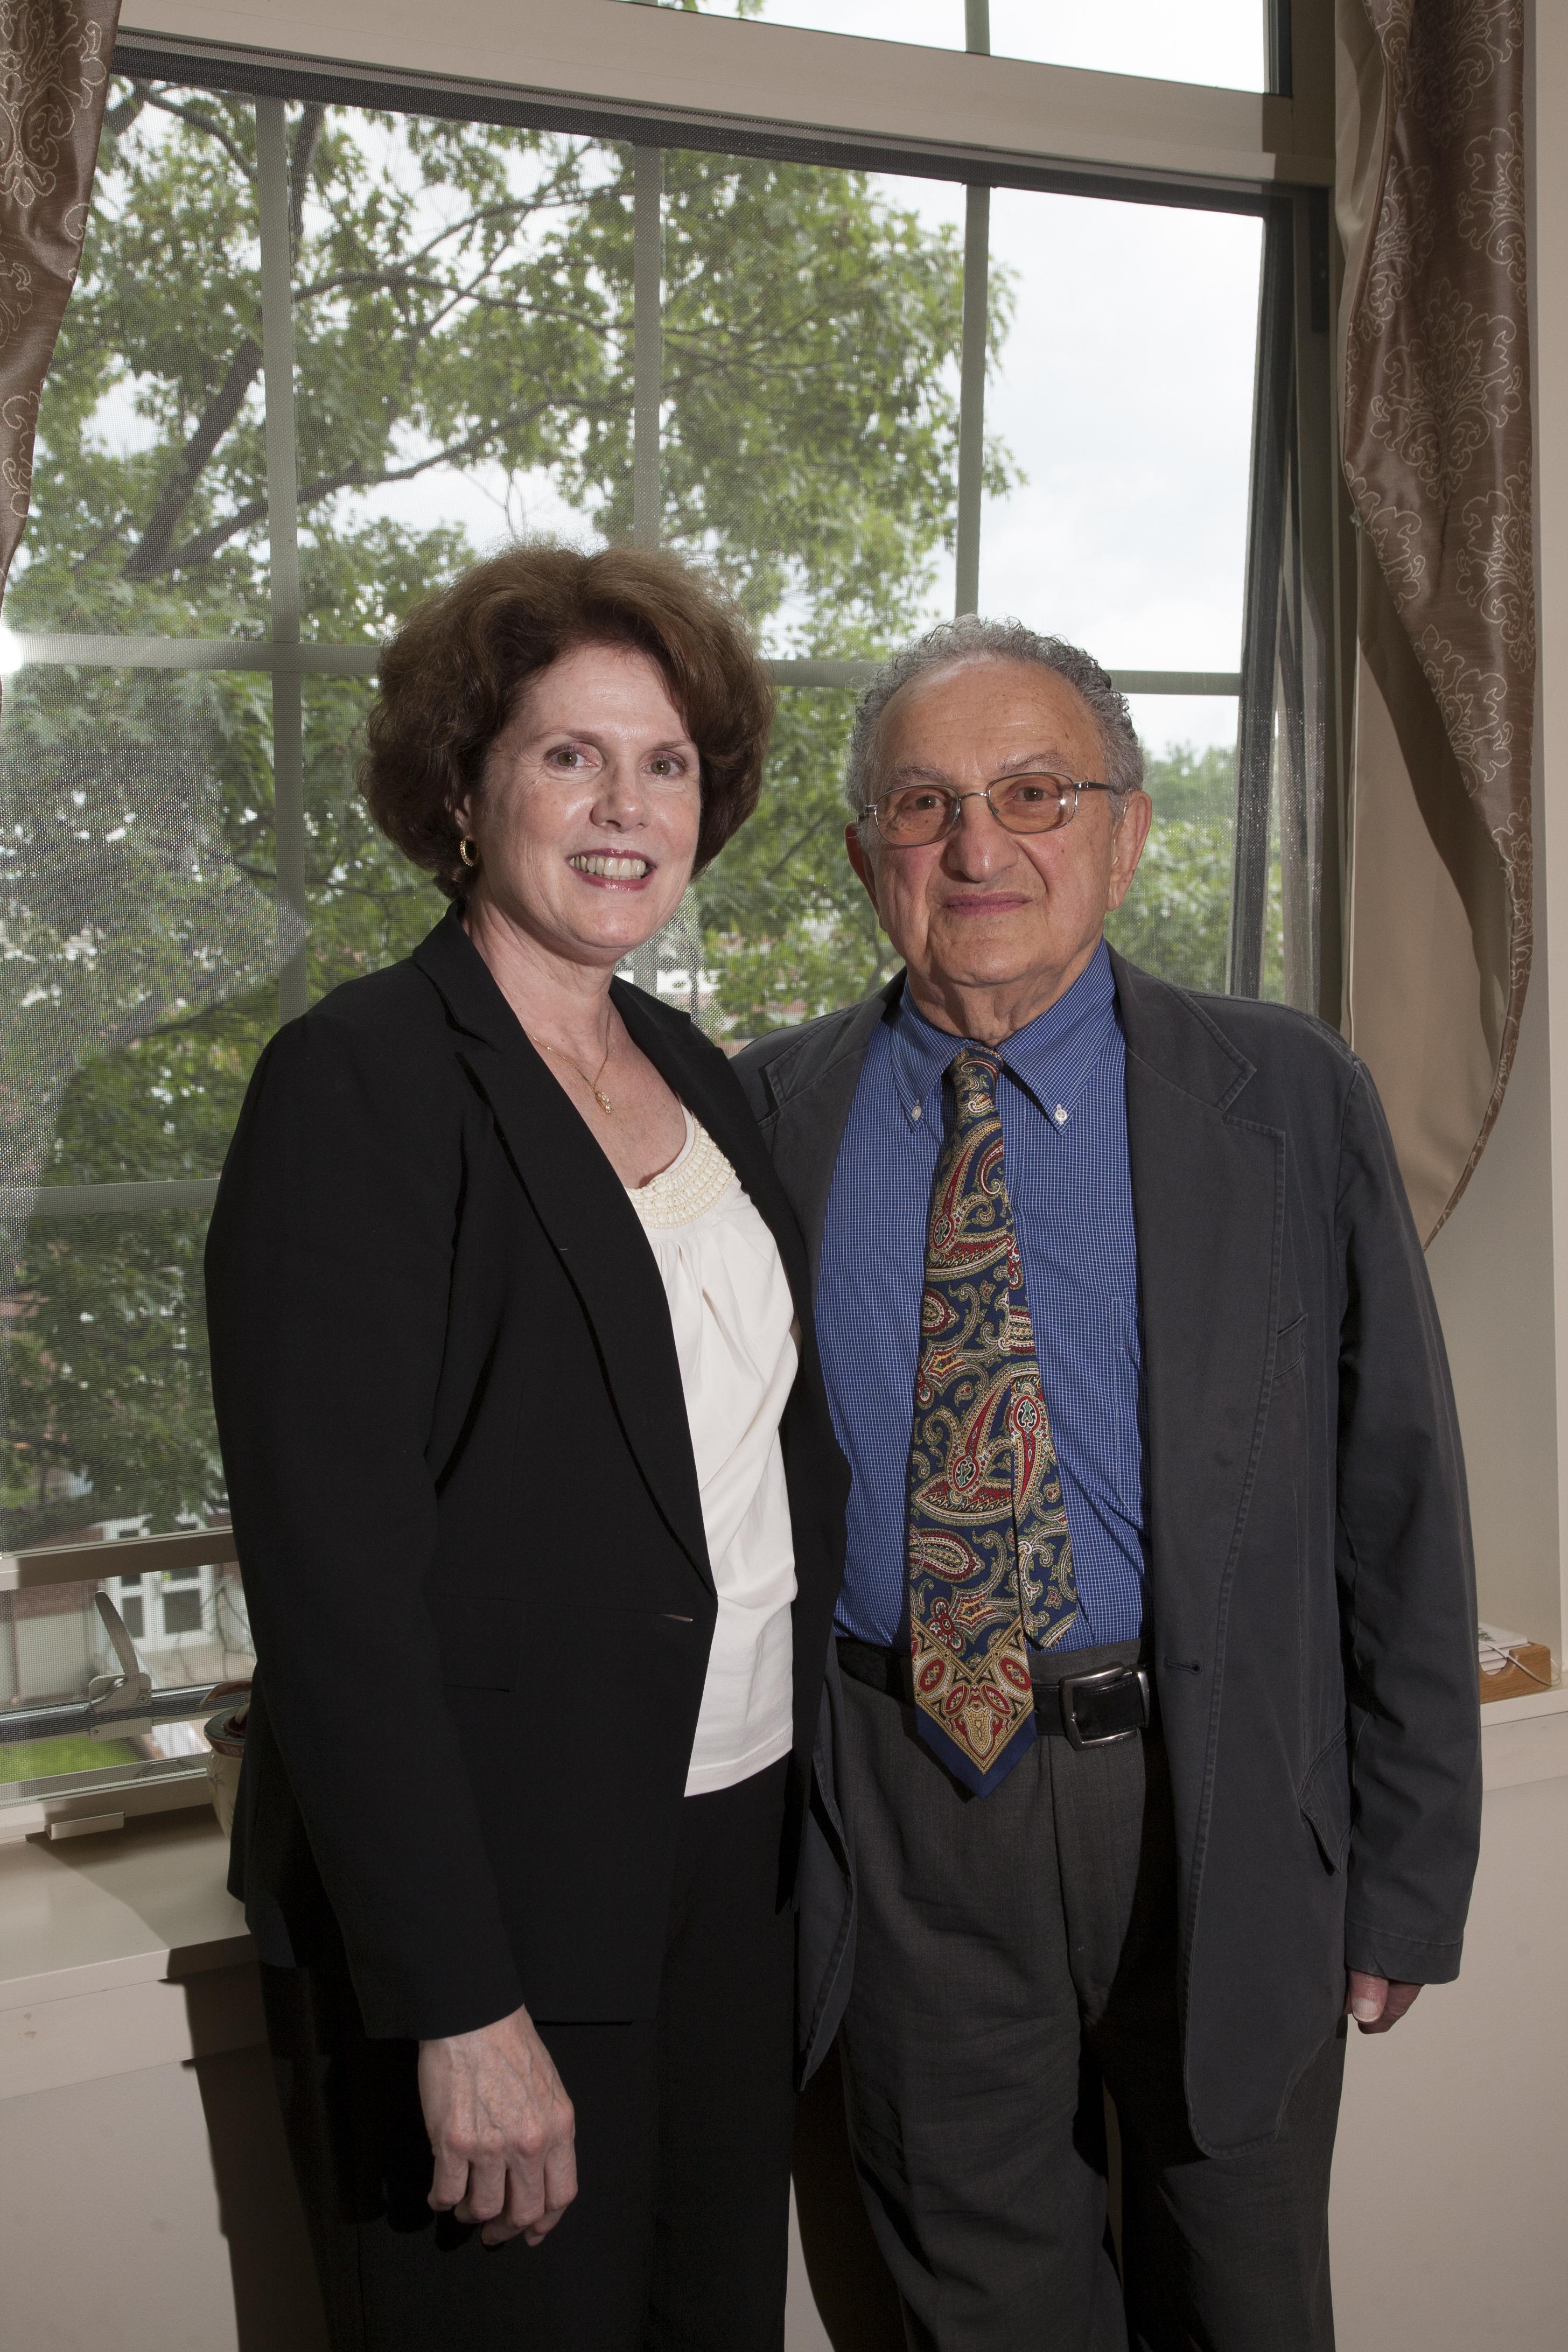 The Dr. Maureen and Edward Shamgochian Endowed Scholarship